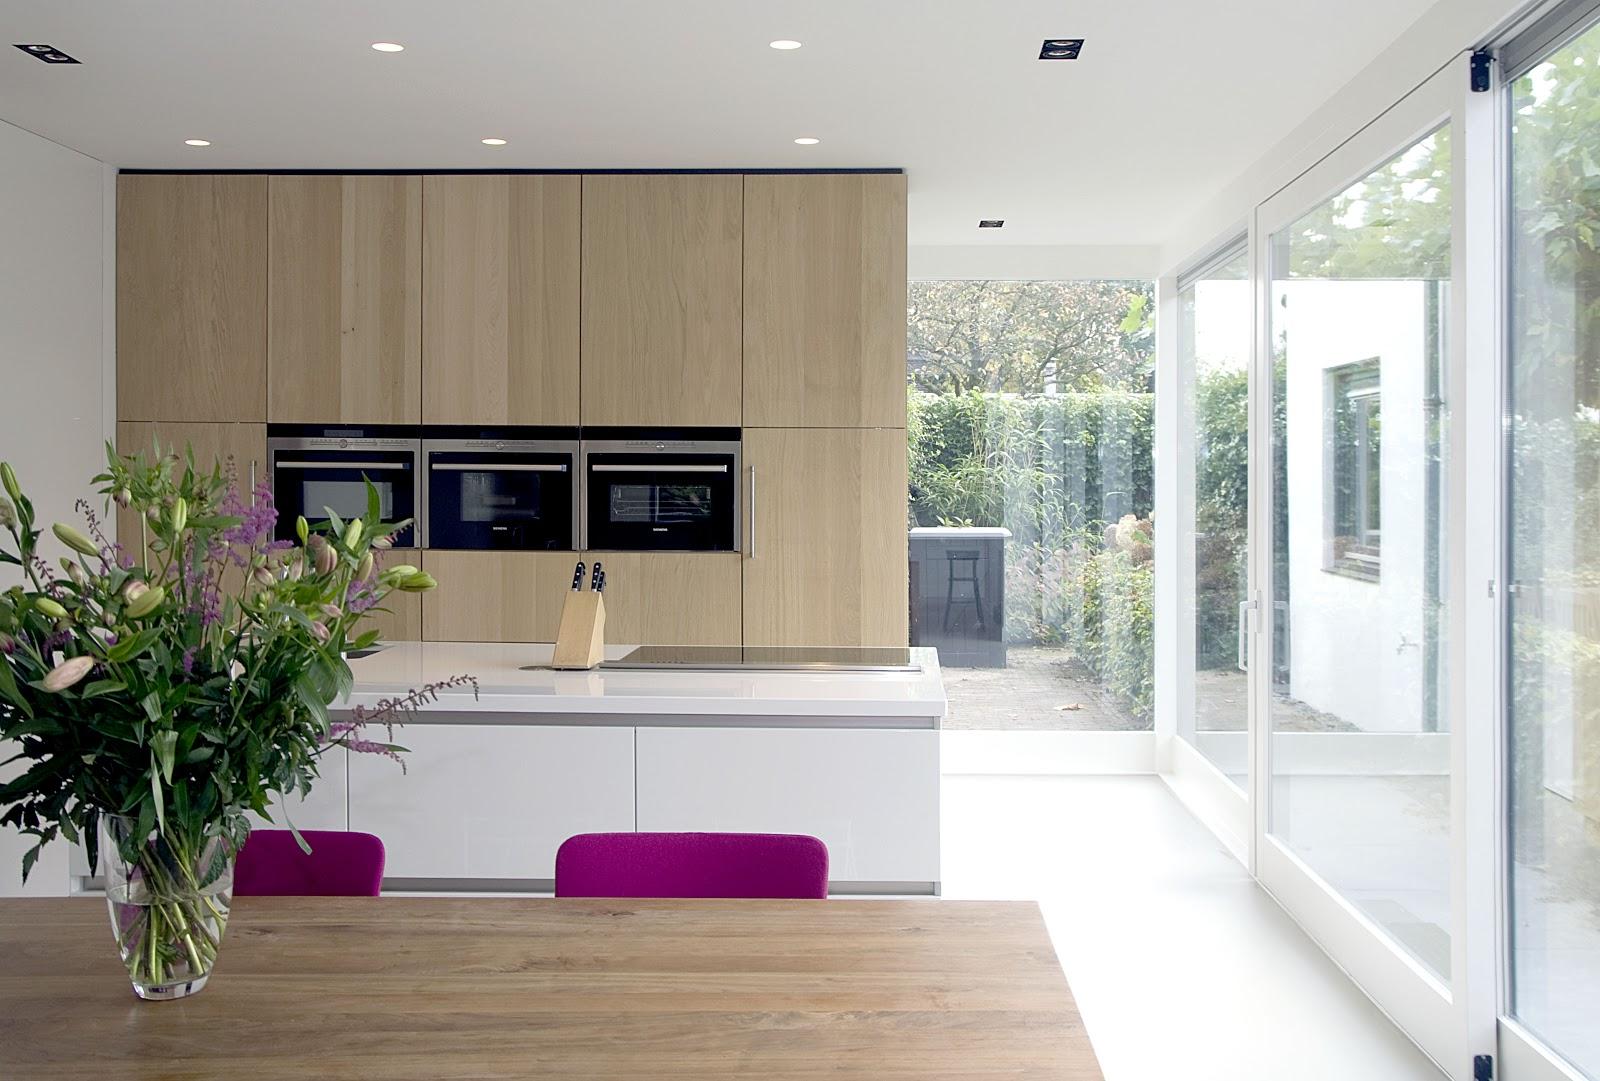 Keuken Eikenhout : Keuken Kastenwand, Moodboard Keuken, Interior, Keukenleven, Bijbouw